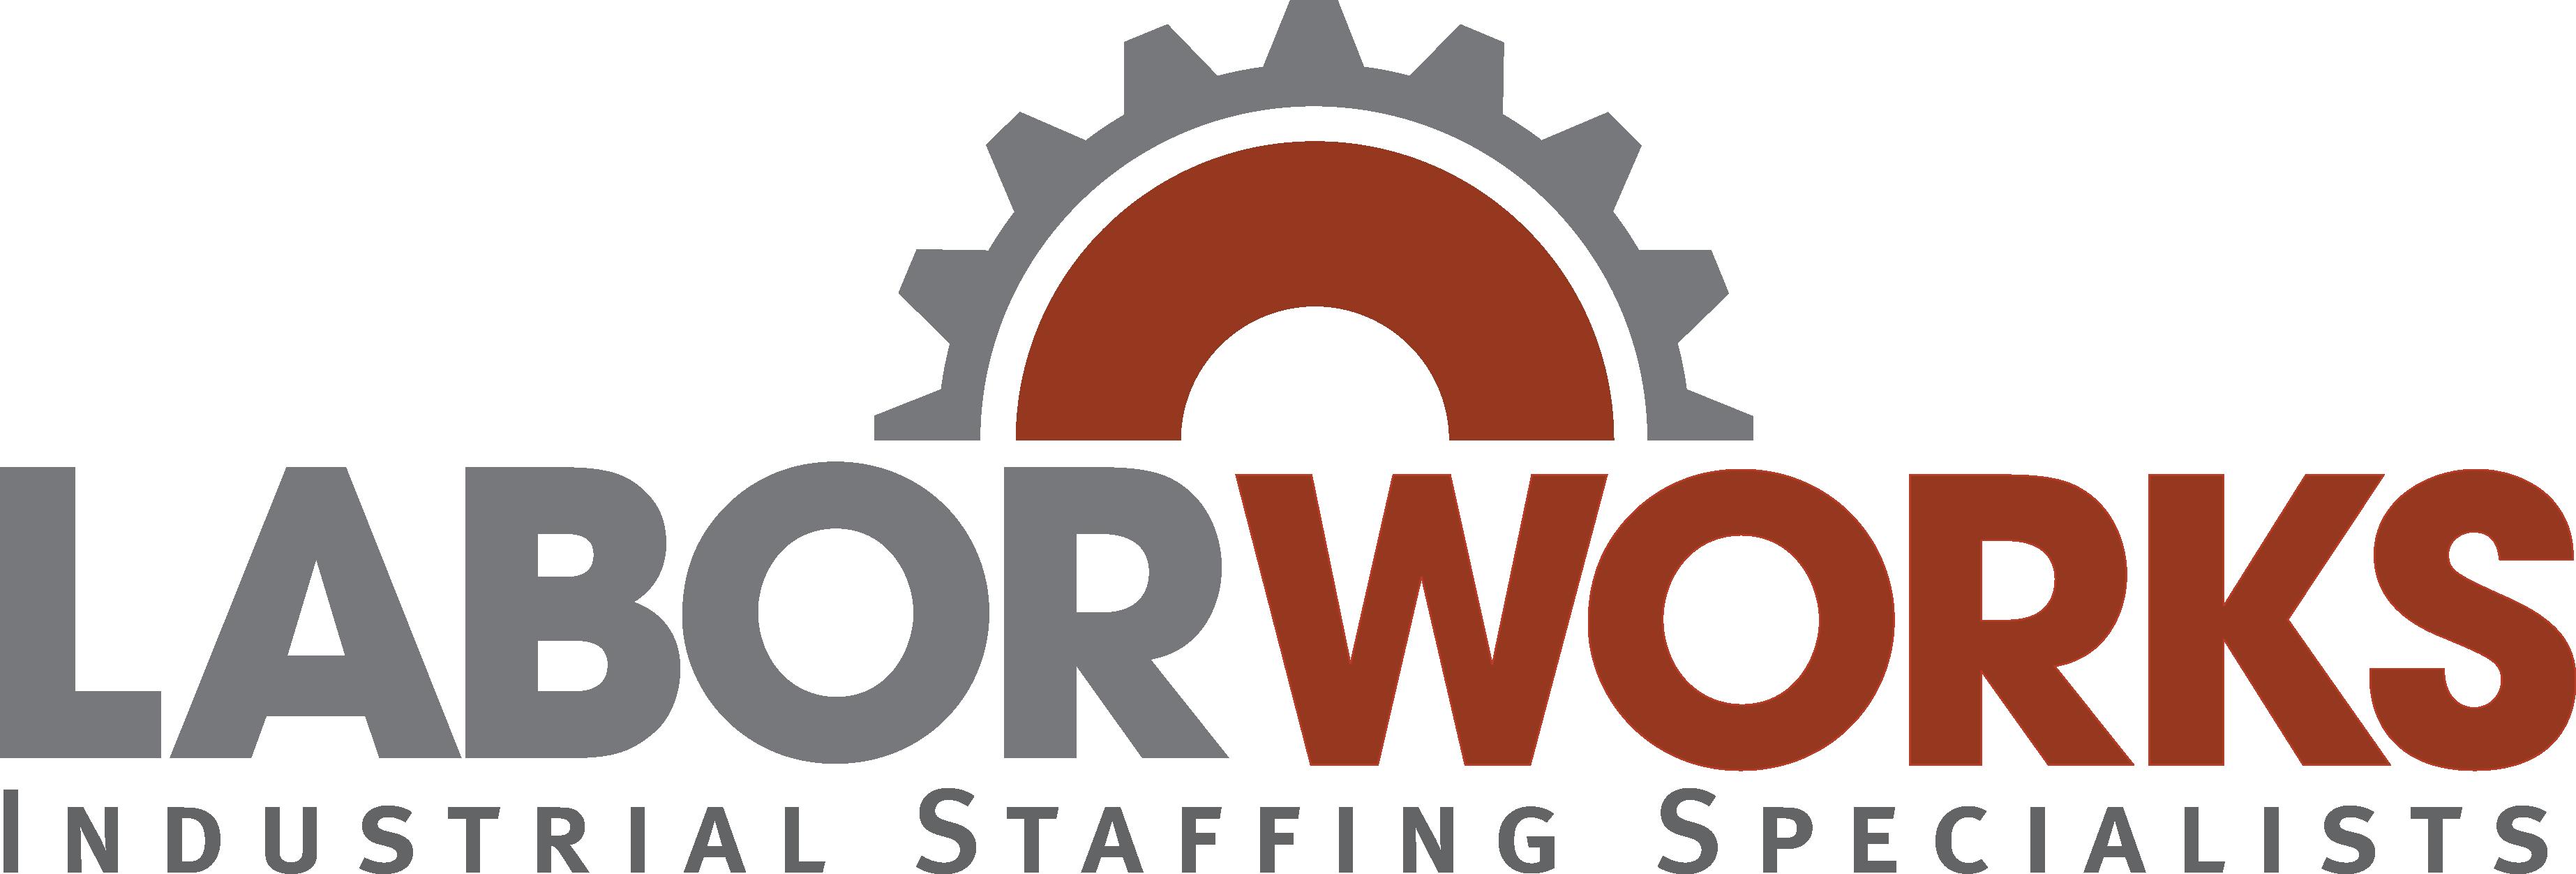 LaborWorks logo